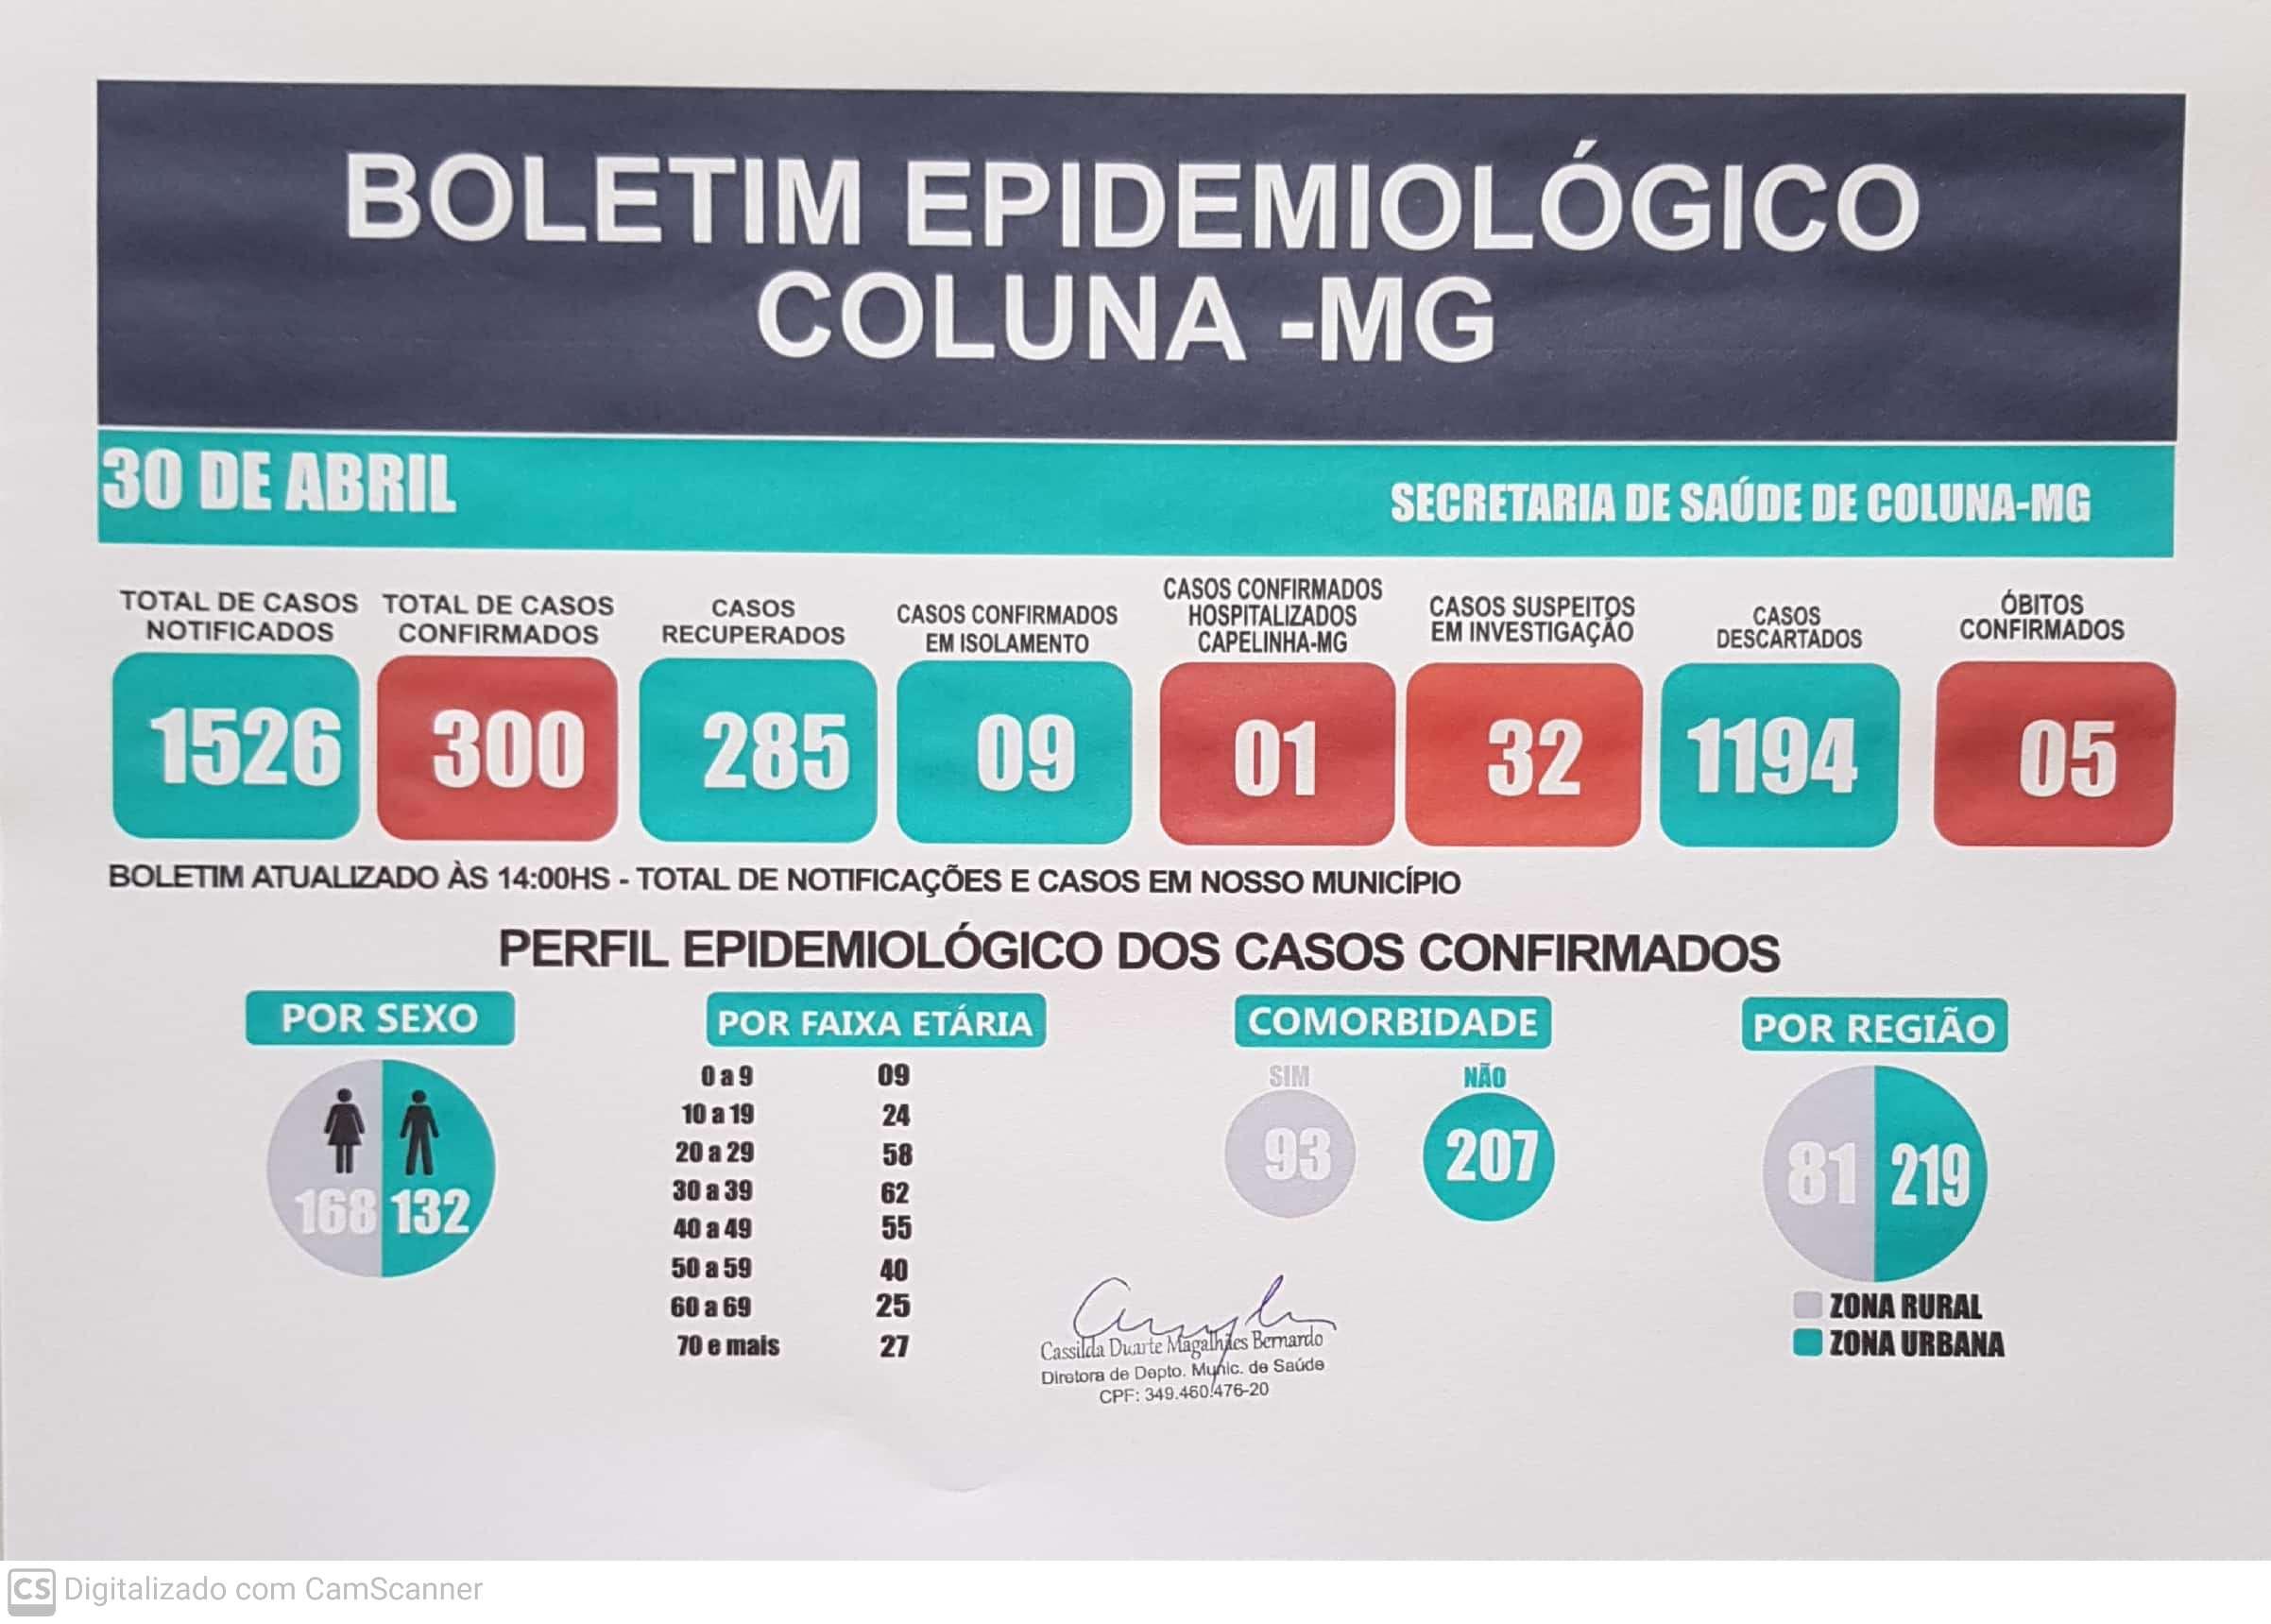 BOLETIM EPIDEMIOLÓGICO COLUNA - MG 30/04/2021